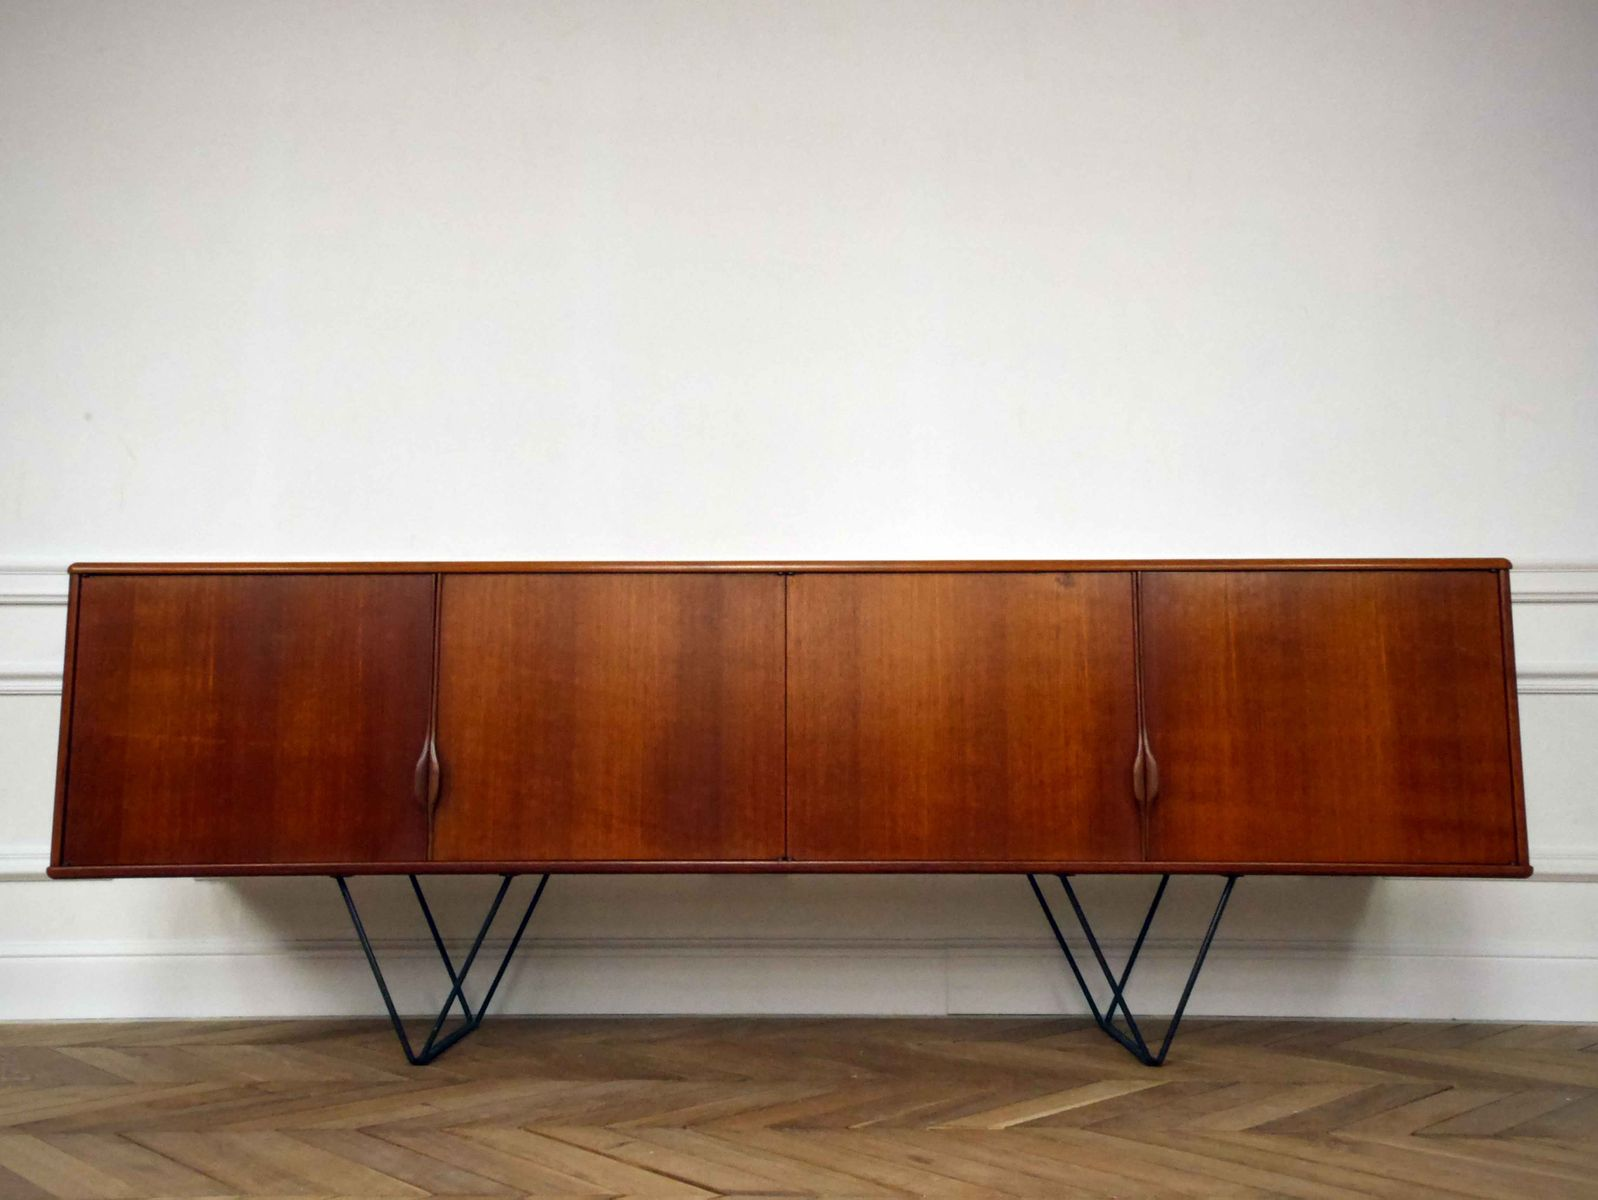 Vintage Scandinavian Sideboard with Metal Legs, 1960s - Vintage Scandinavian Sideboard With Metal Legs, 1960s For Sale At